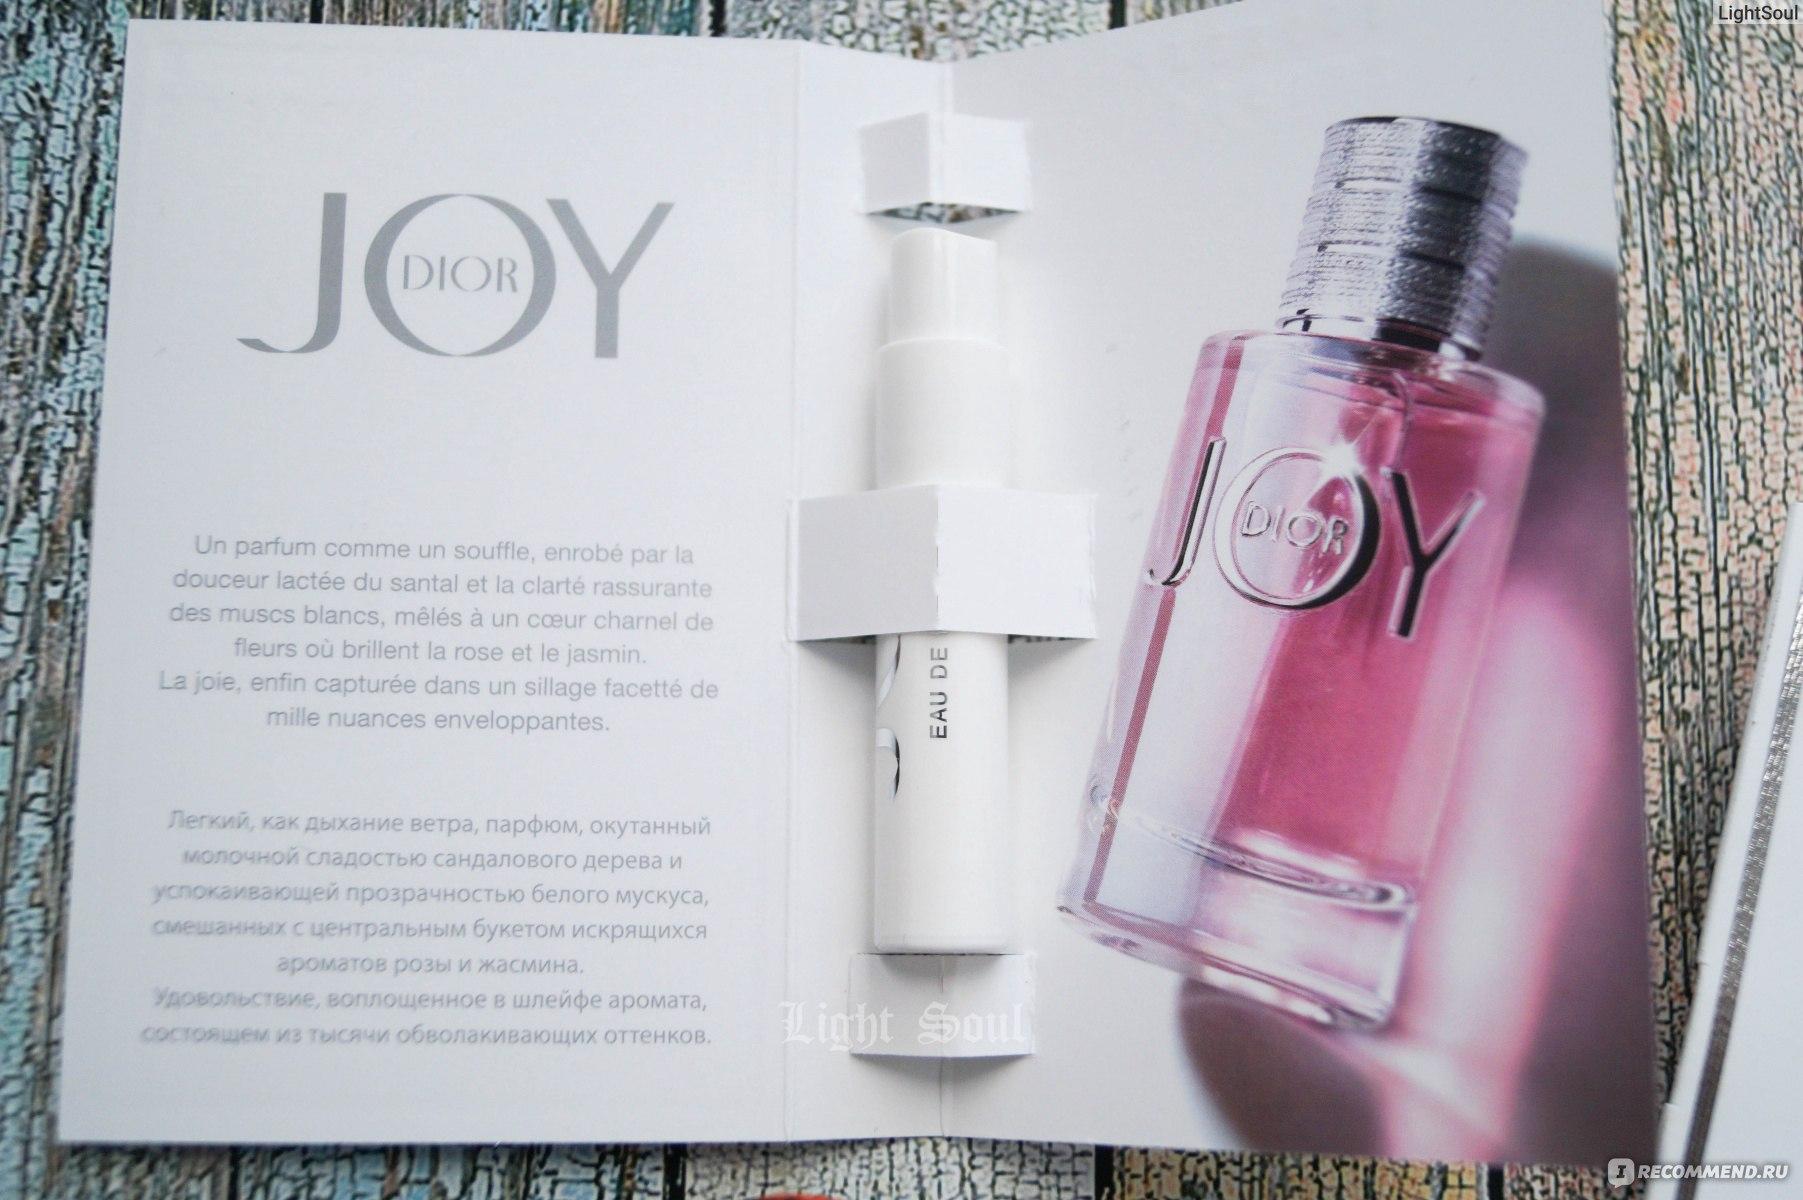 Dior Joy By Dior Eau De Parfum согревающий аромат на холодное